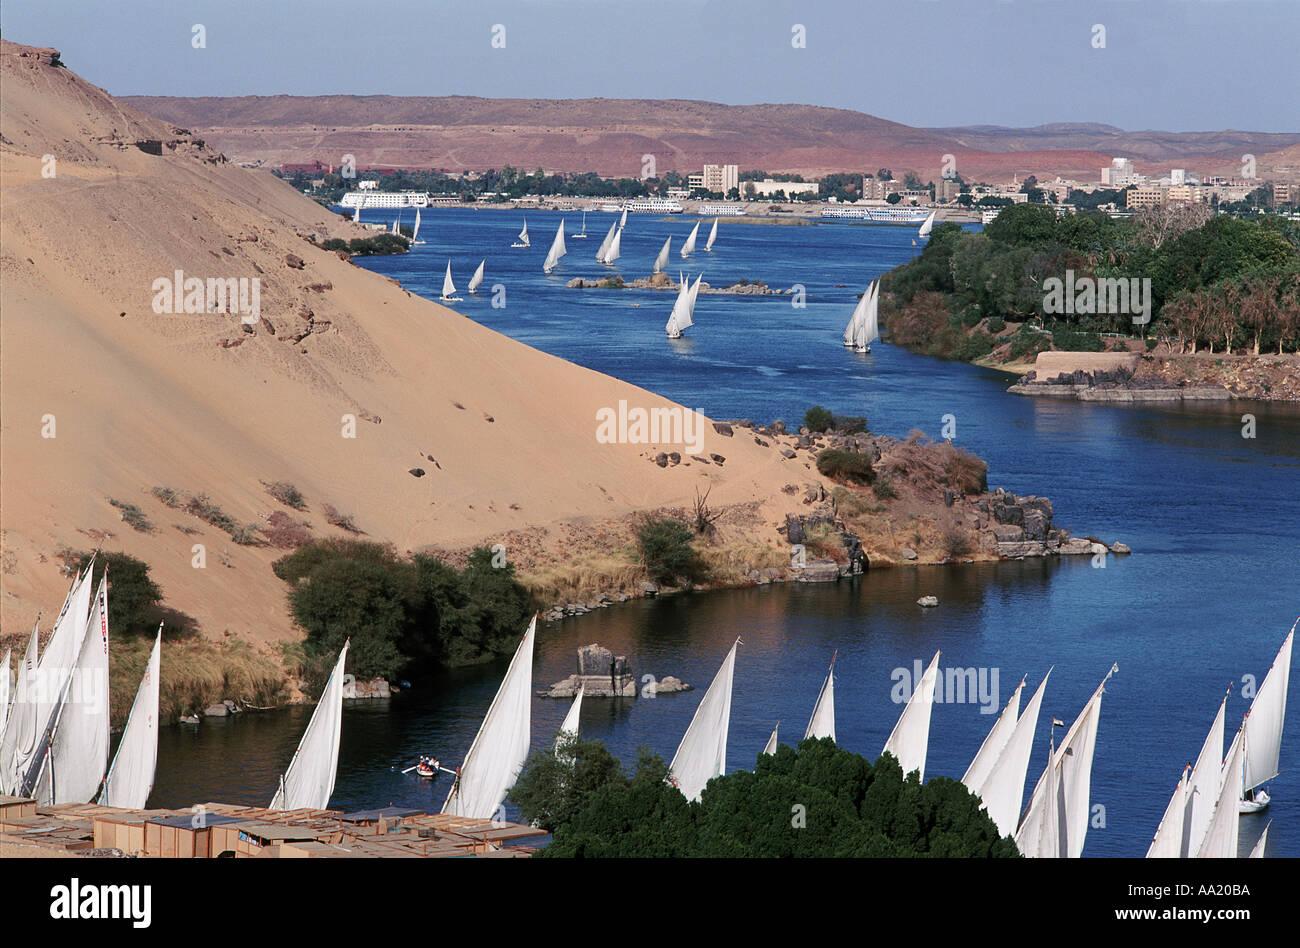 Egypt Assouan - Stock Image